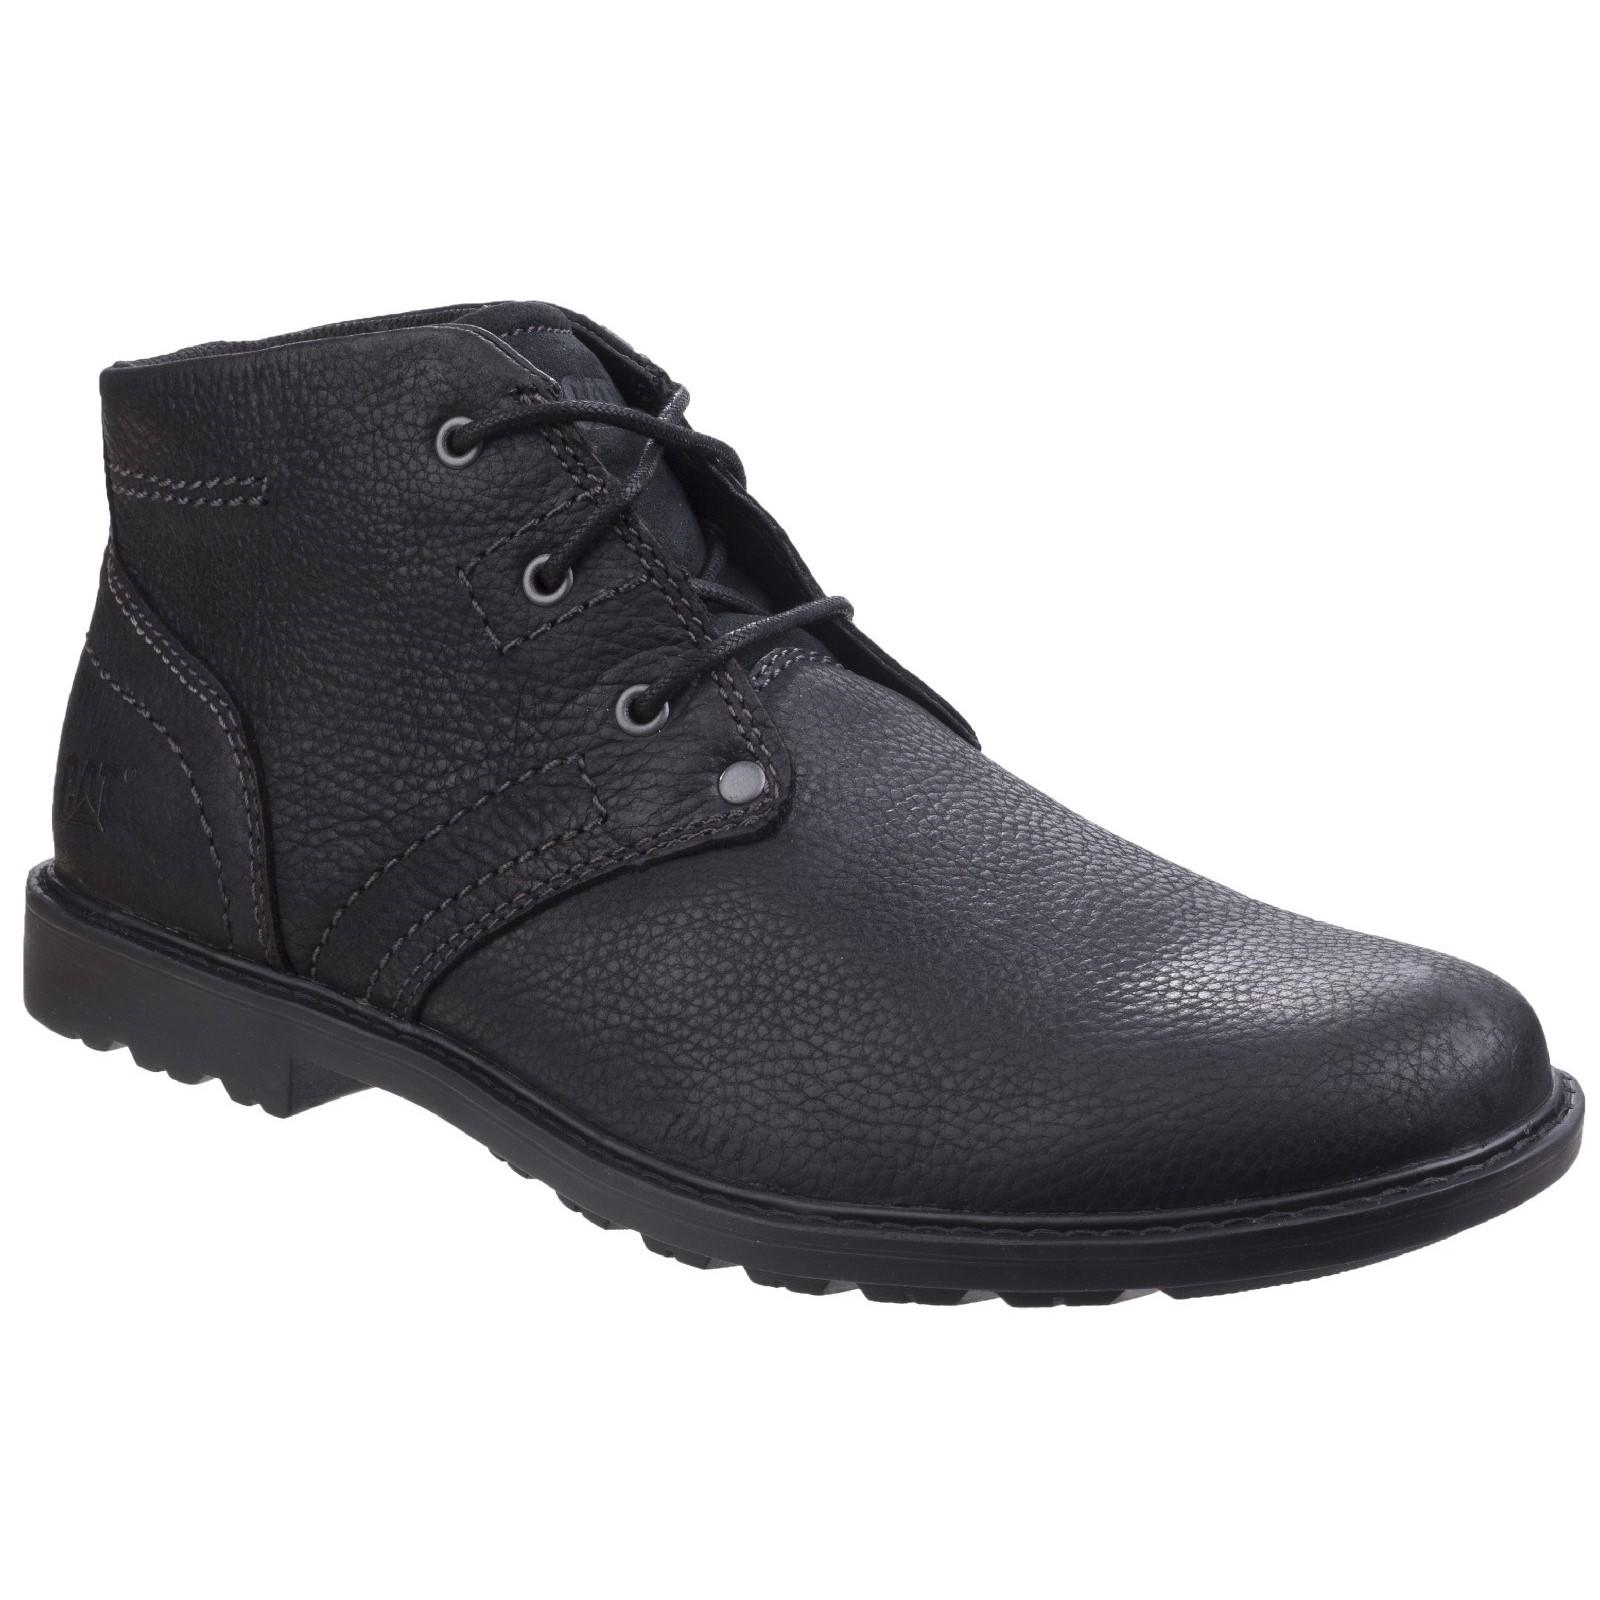 CAT Lifestyle Herren Carsen Mid Pebble Schnürsenkel Schuhe Stiefel